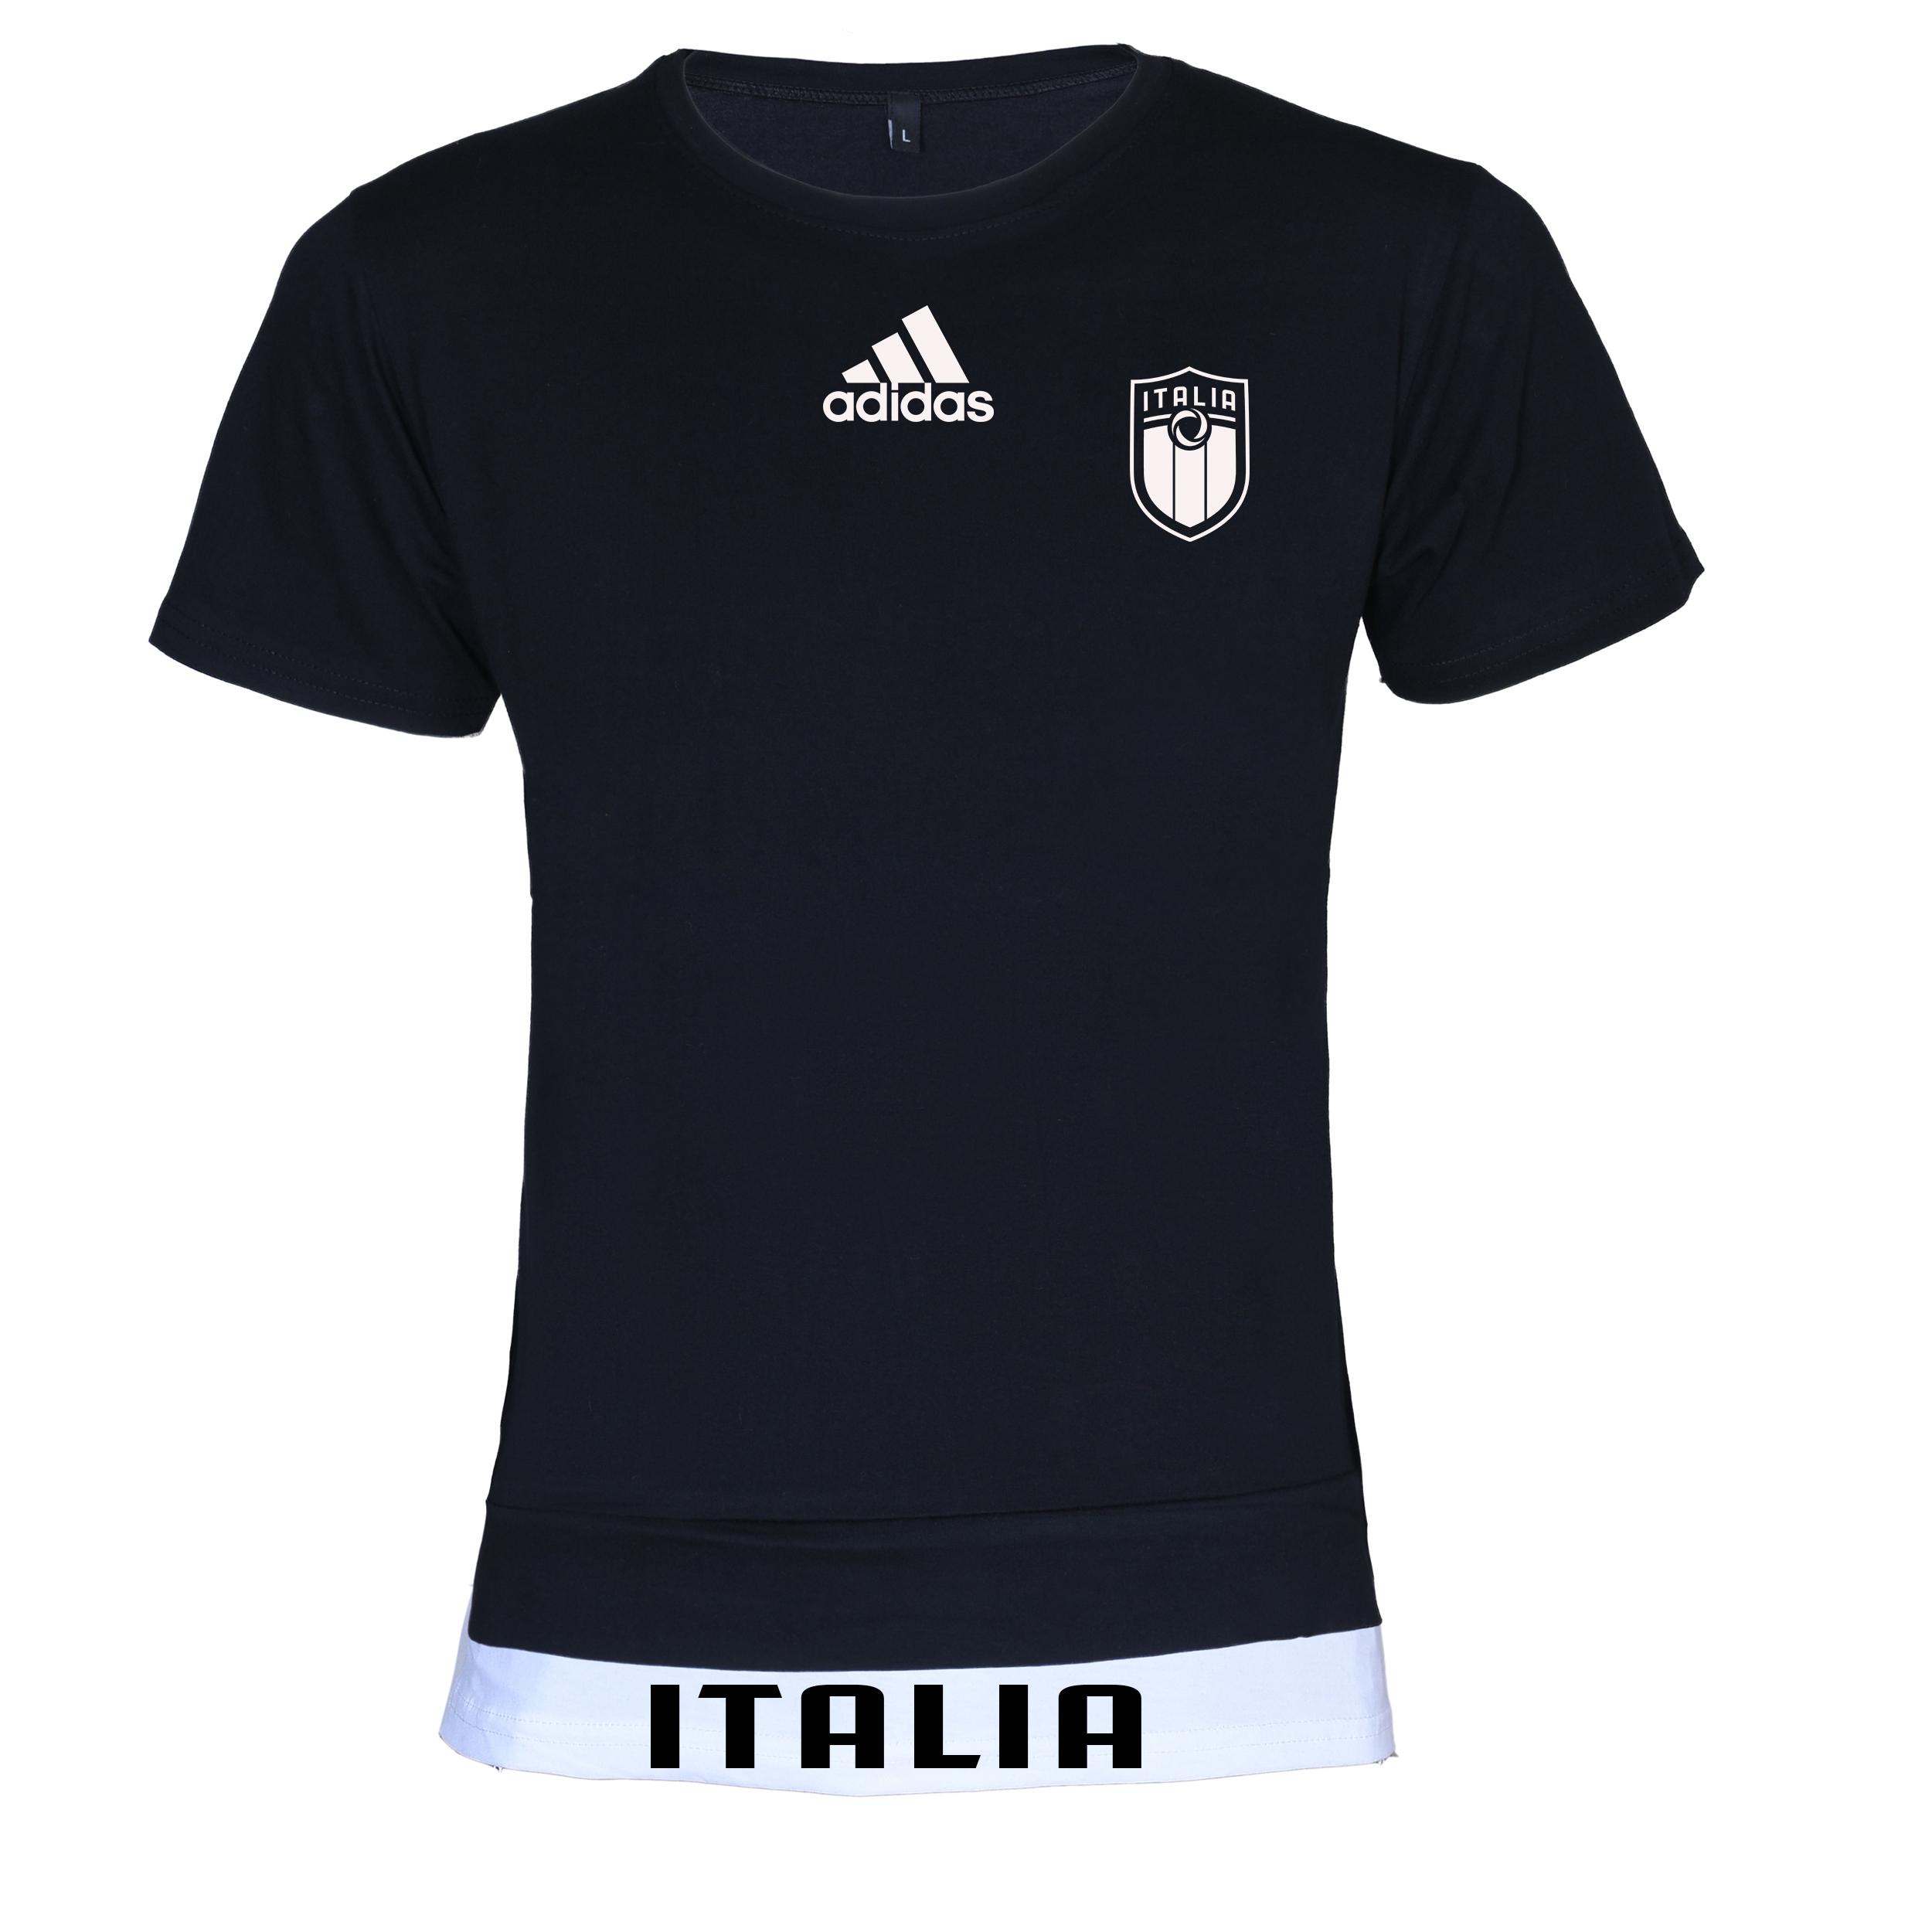 تیشرت ورزشی مردانه طرح تیم ایتالیا کد 5080